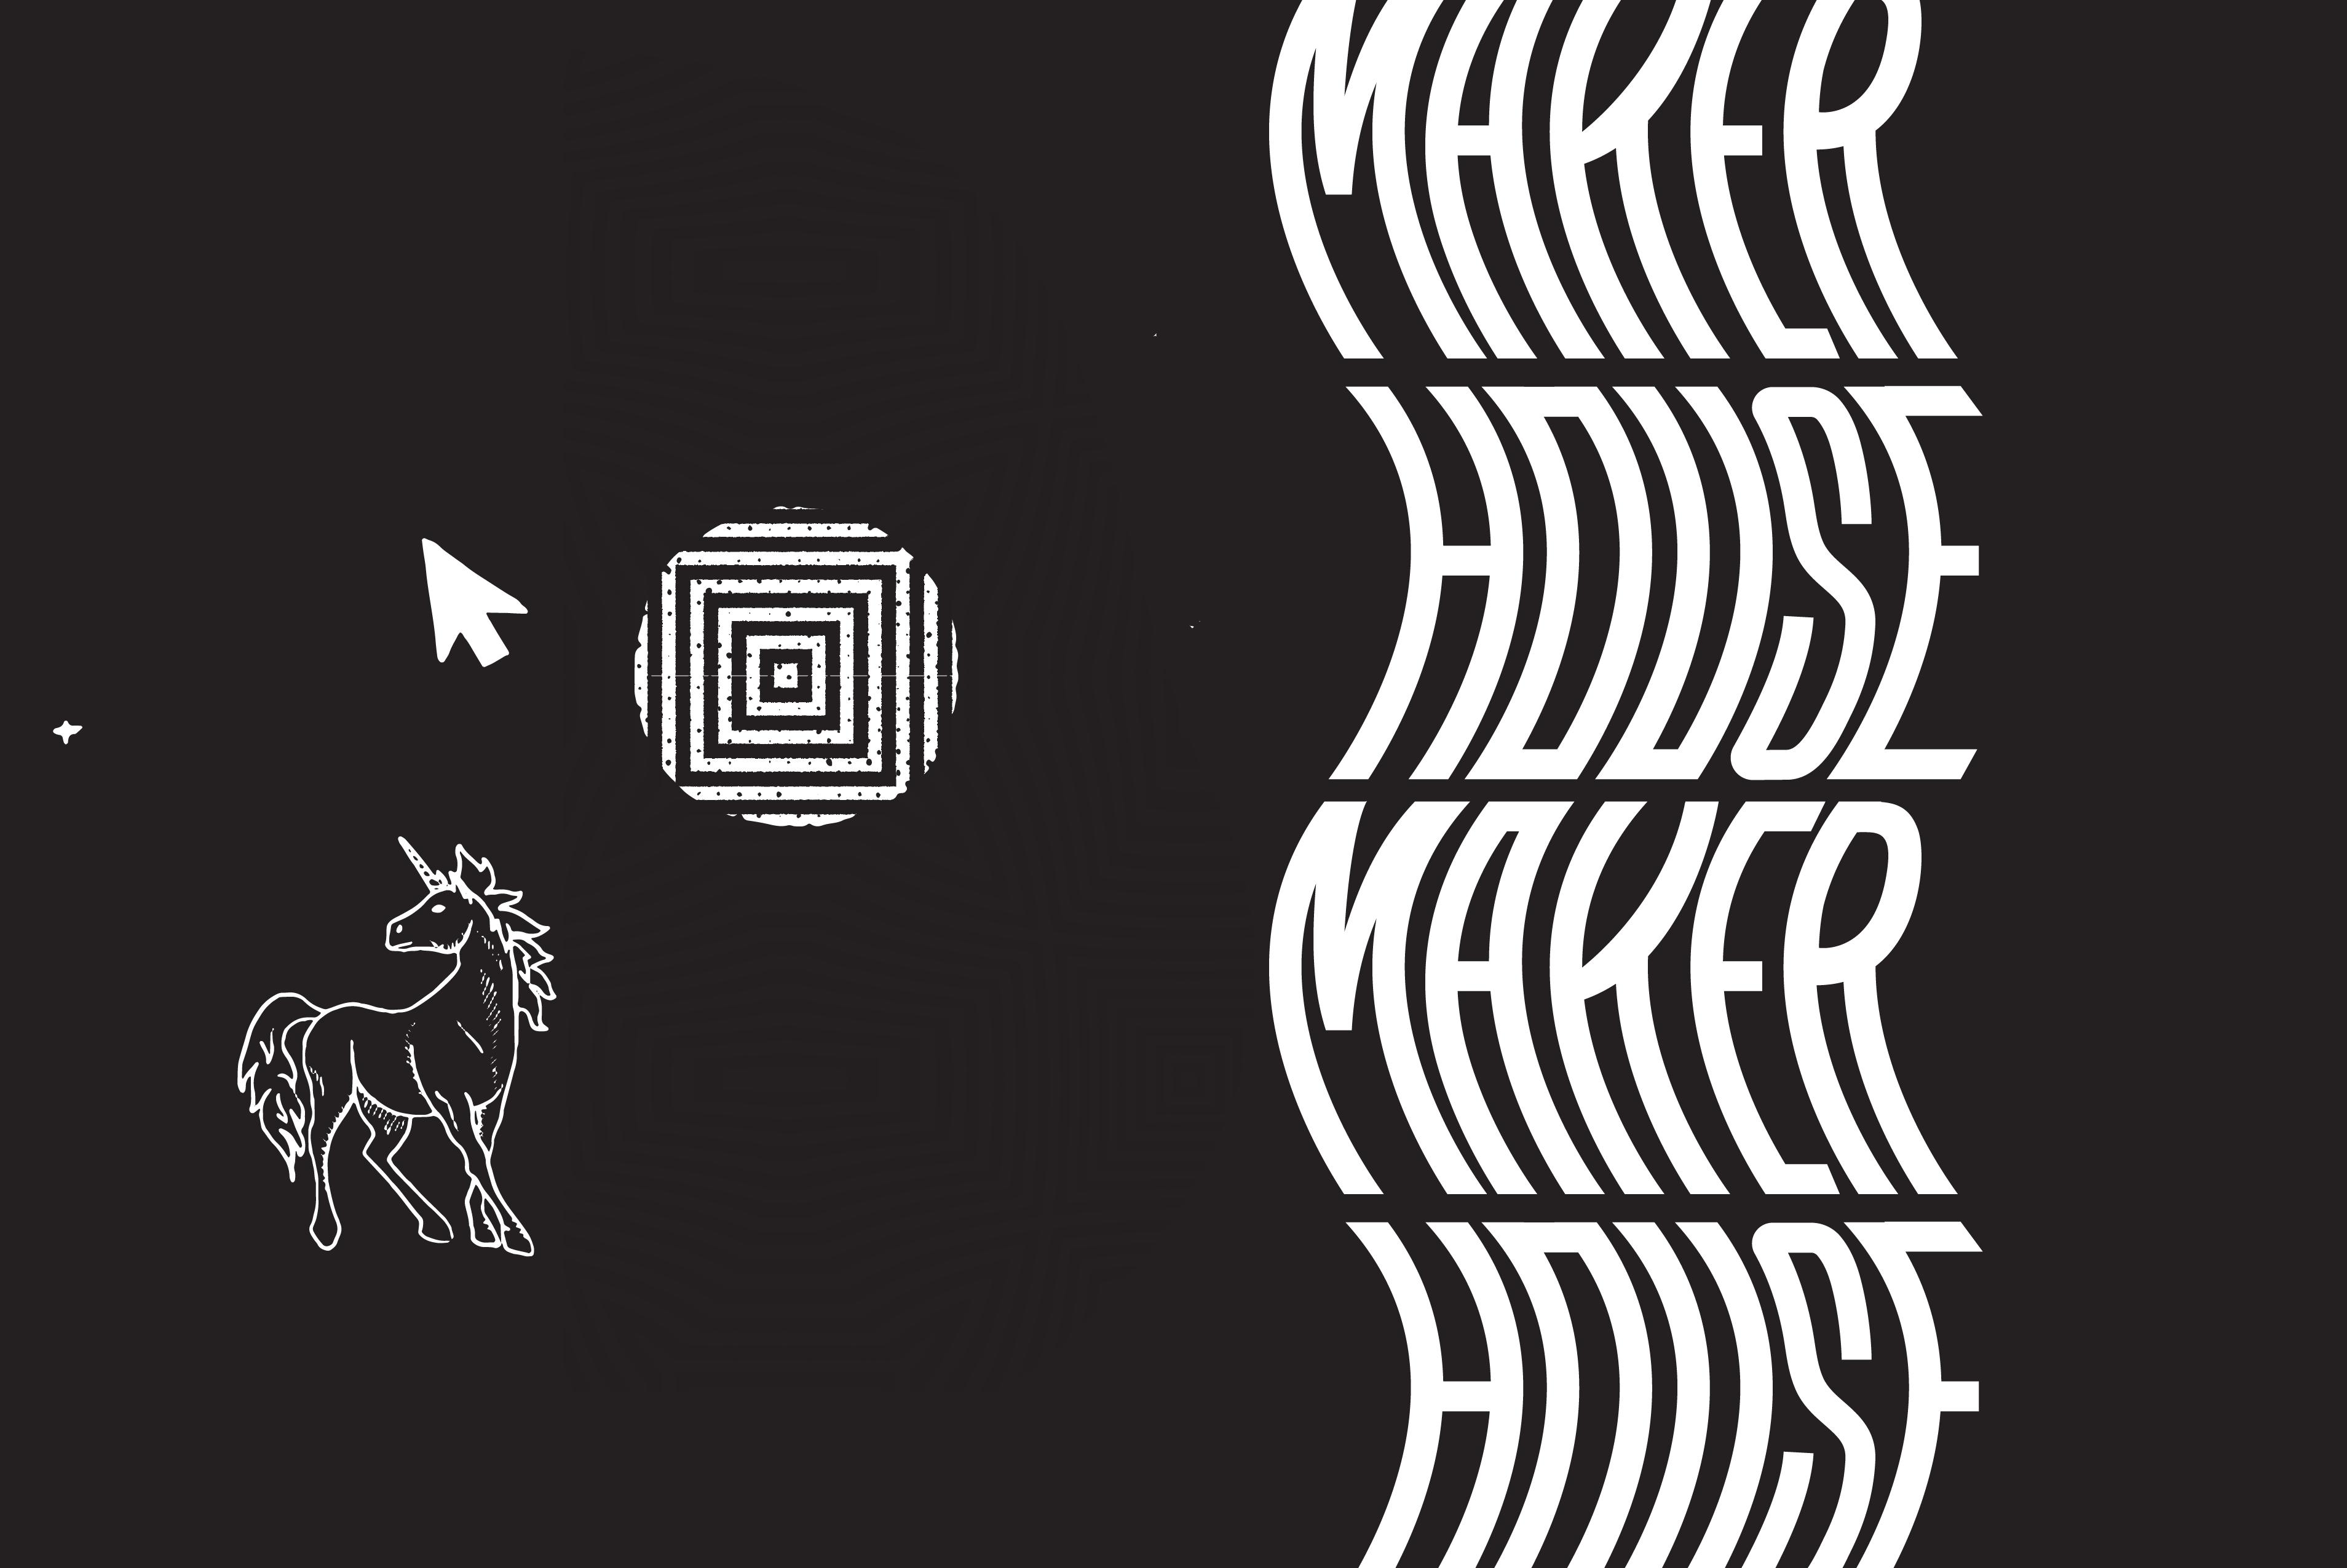 MAKE01001_Makerhouse_Disciplines_JC_C01-02